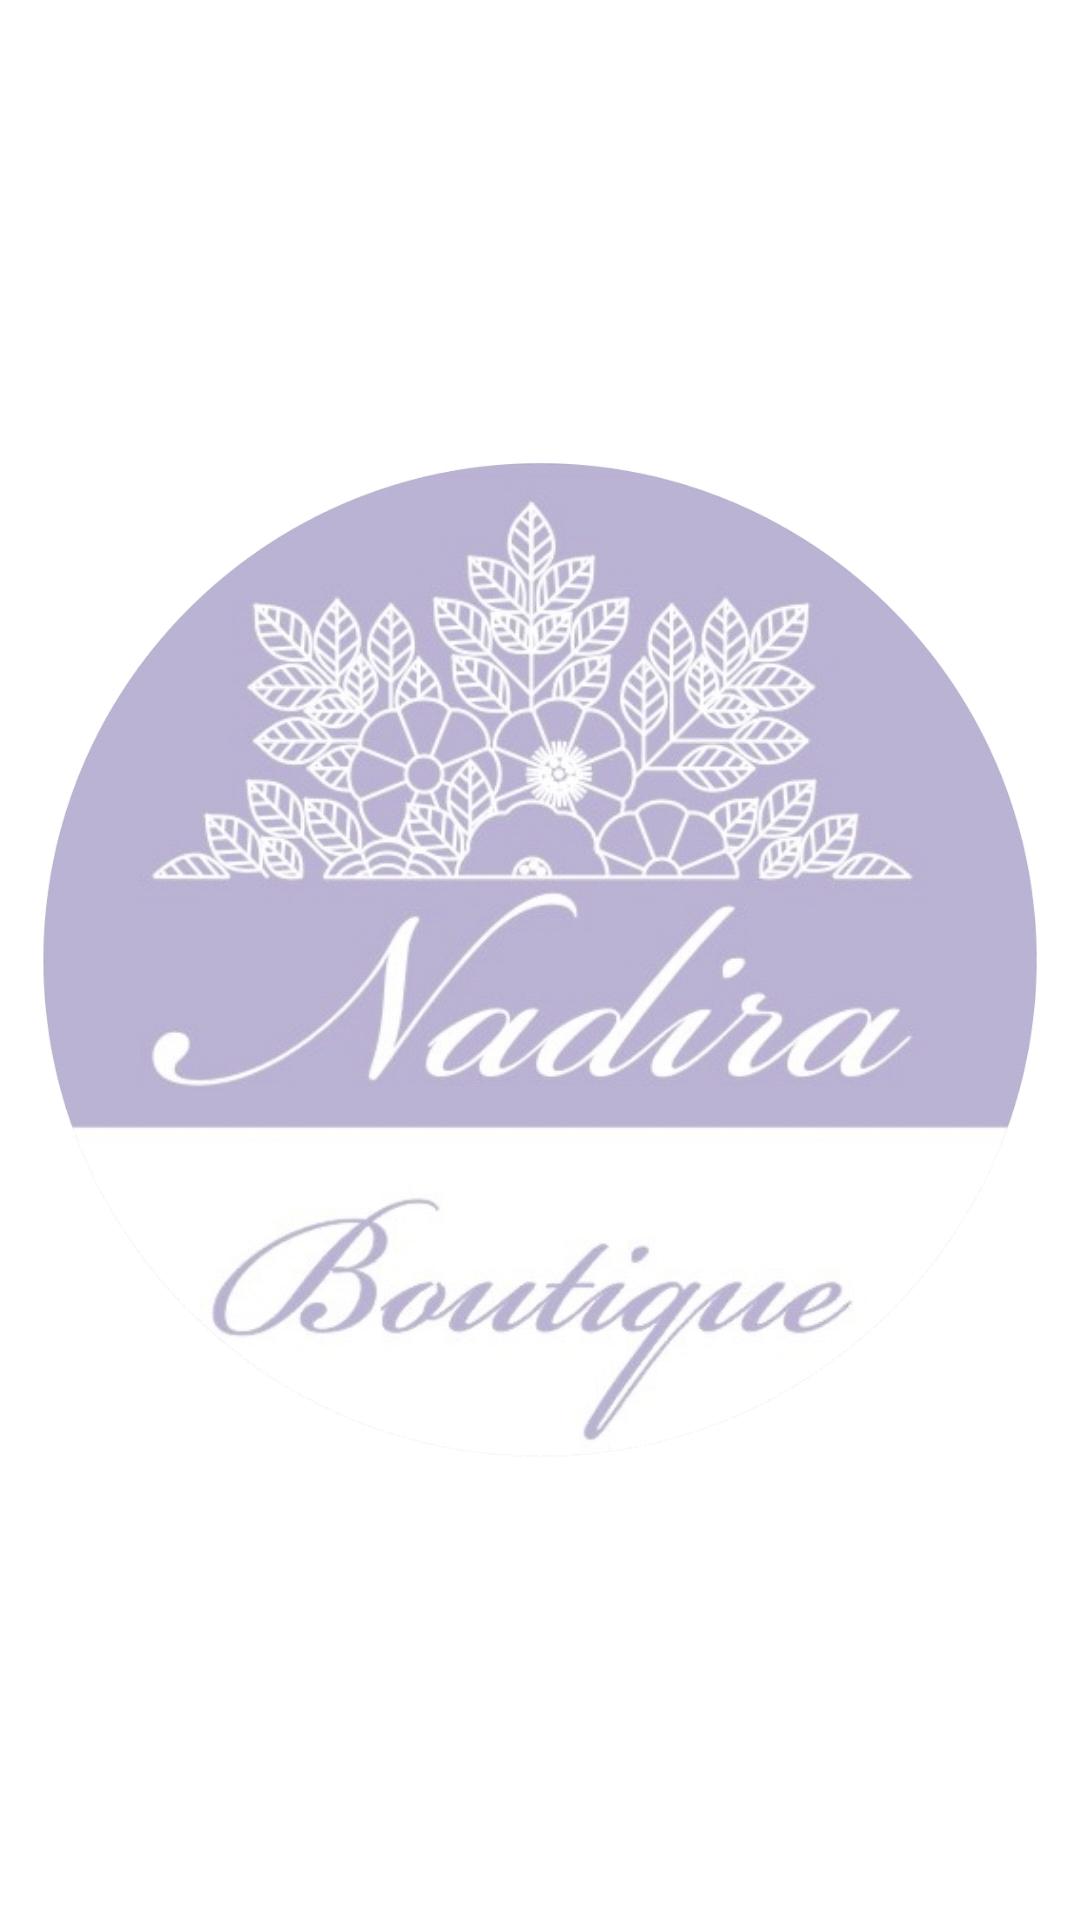 Nadira Boutique